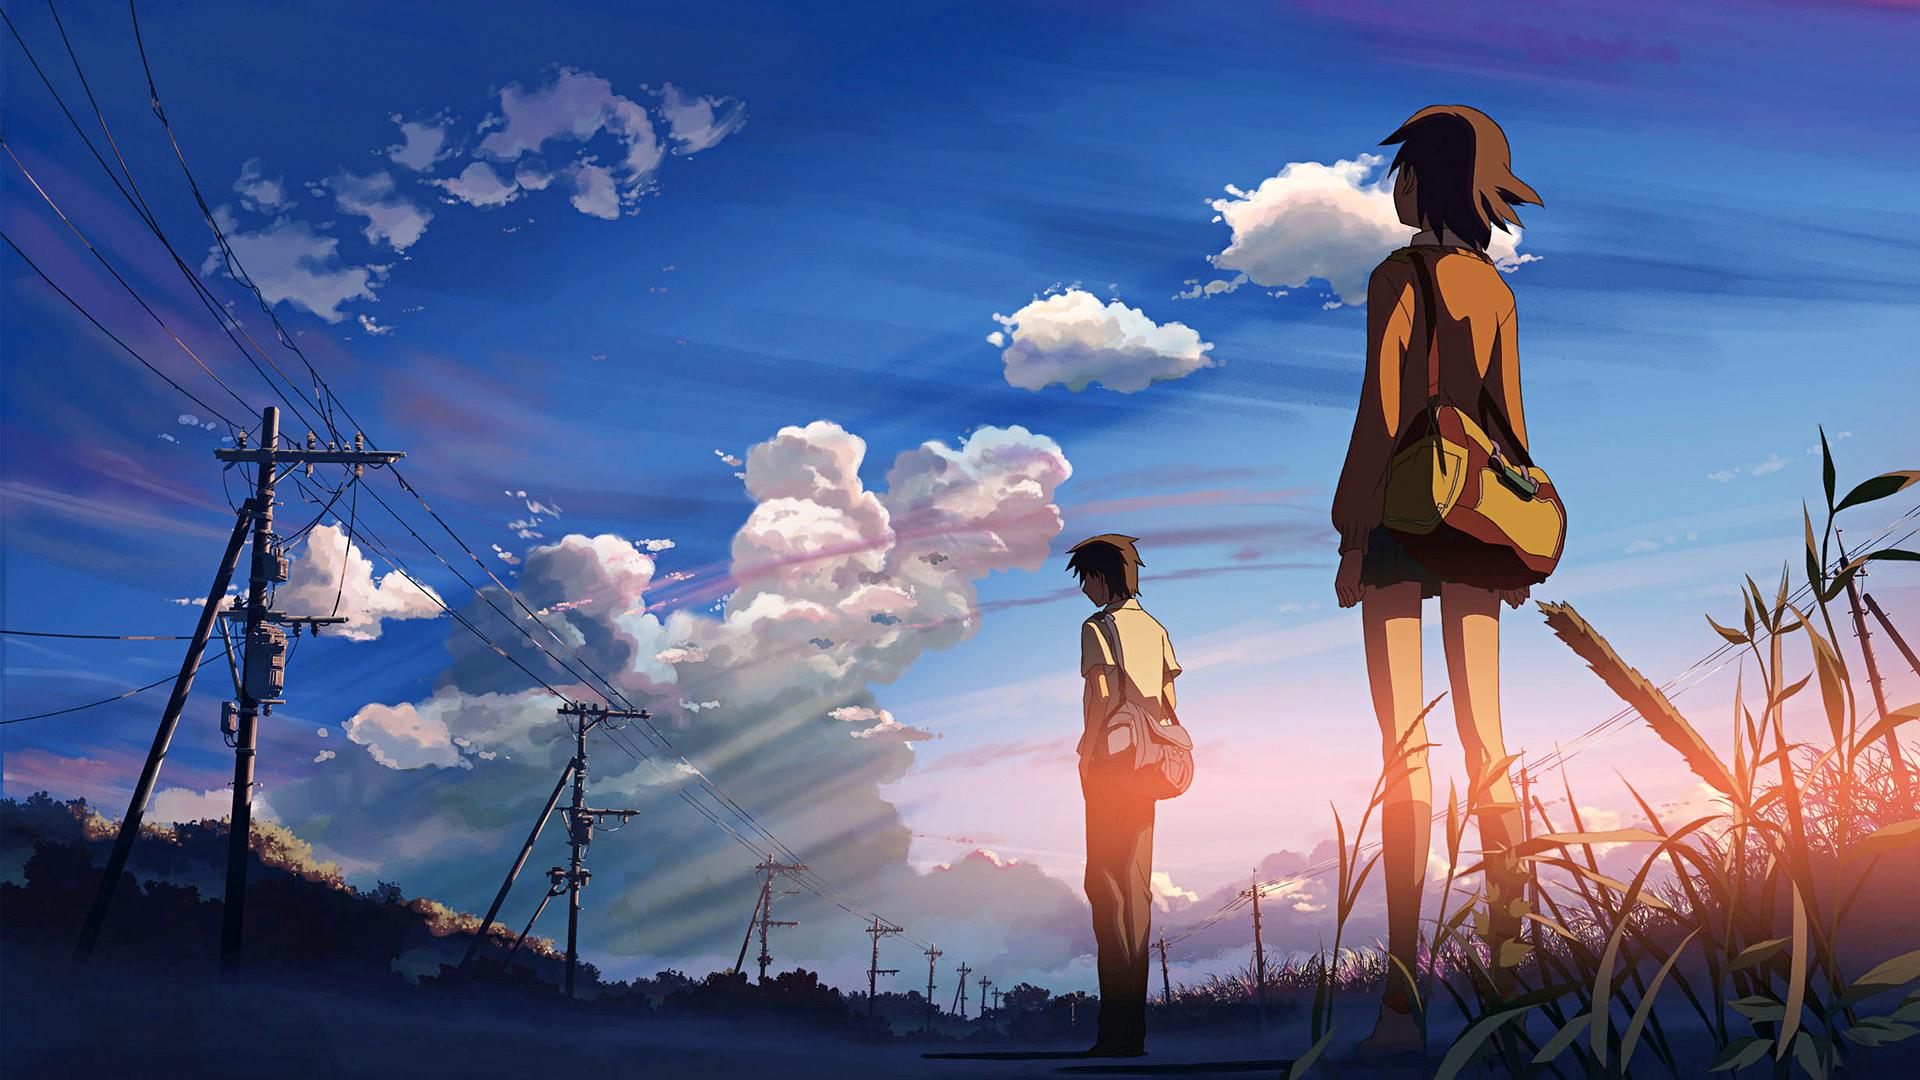 Anime Wallpapers Anime Scenery Wallpaper Anime Scenery Anime Background